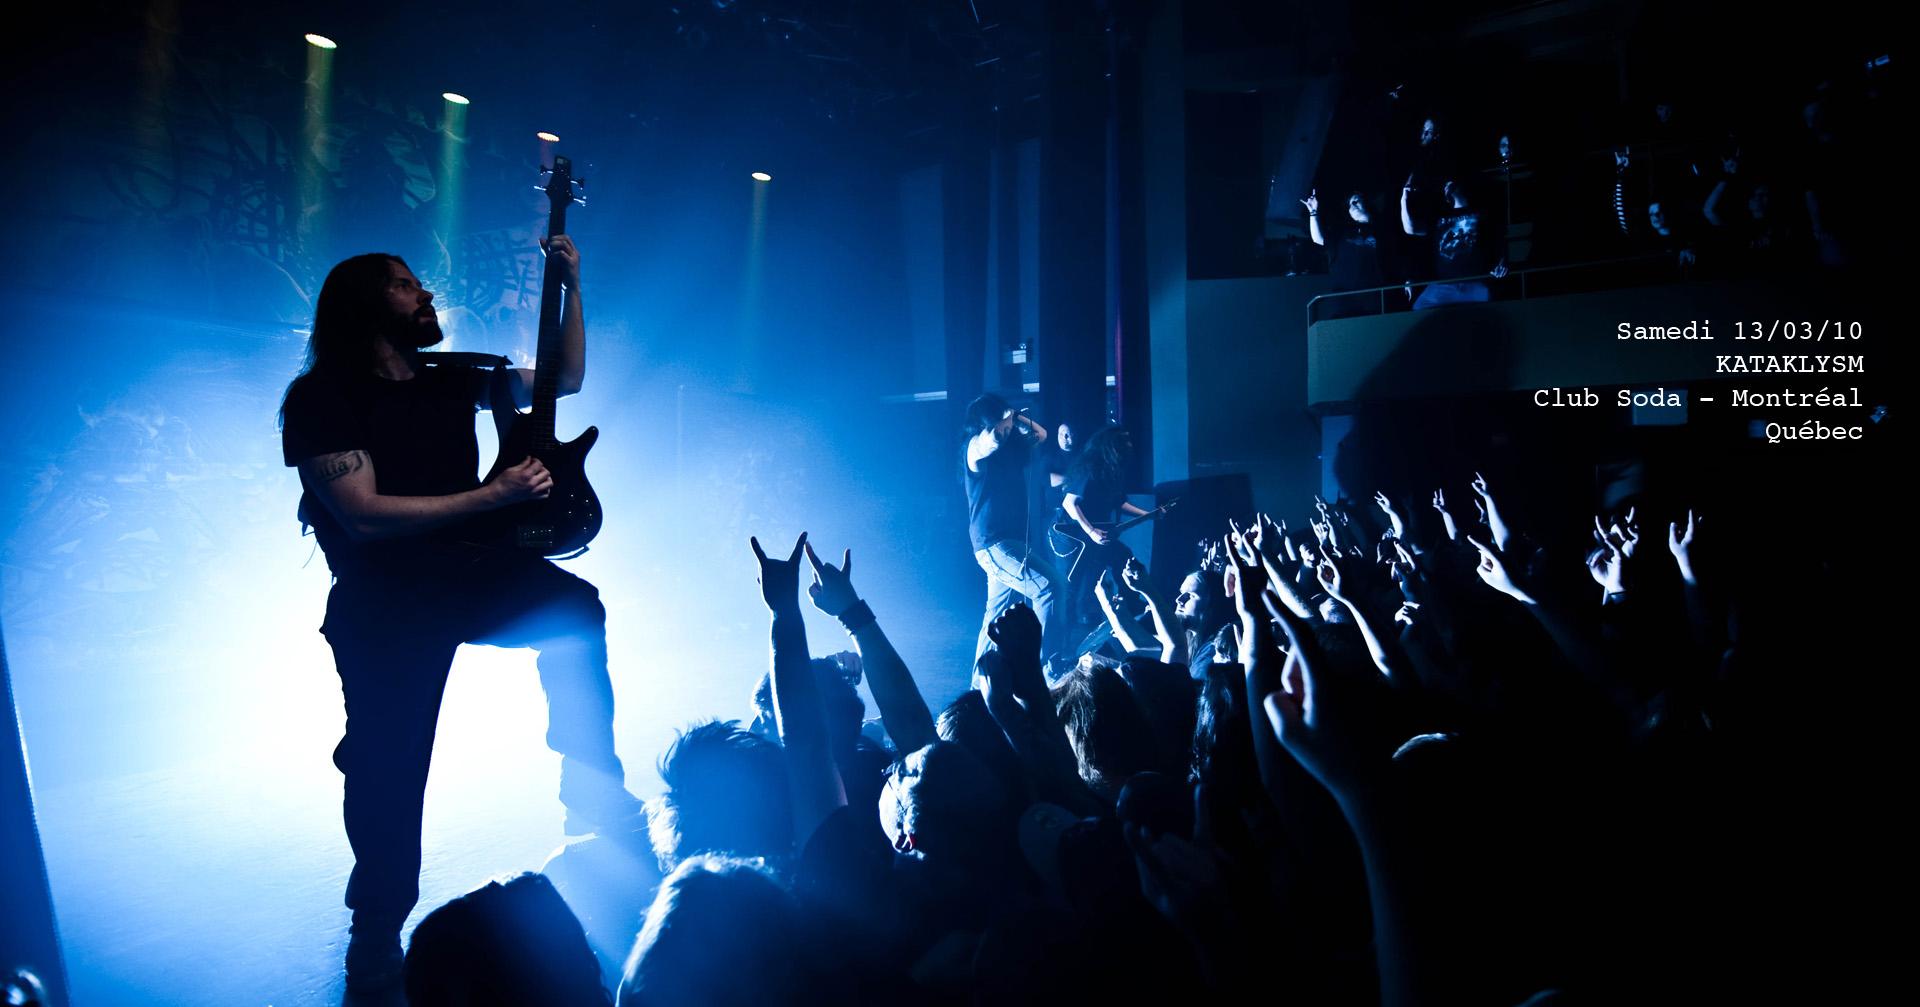 metal heavy hard rock concert concerts crowd a wallpaper background 1920x1007